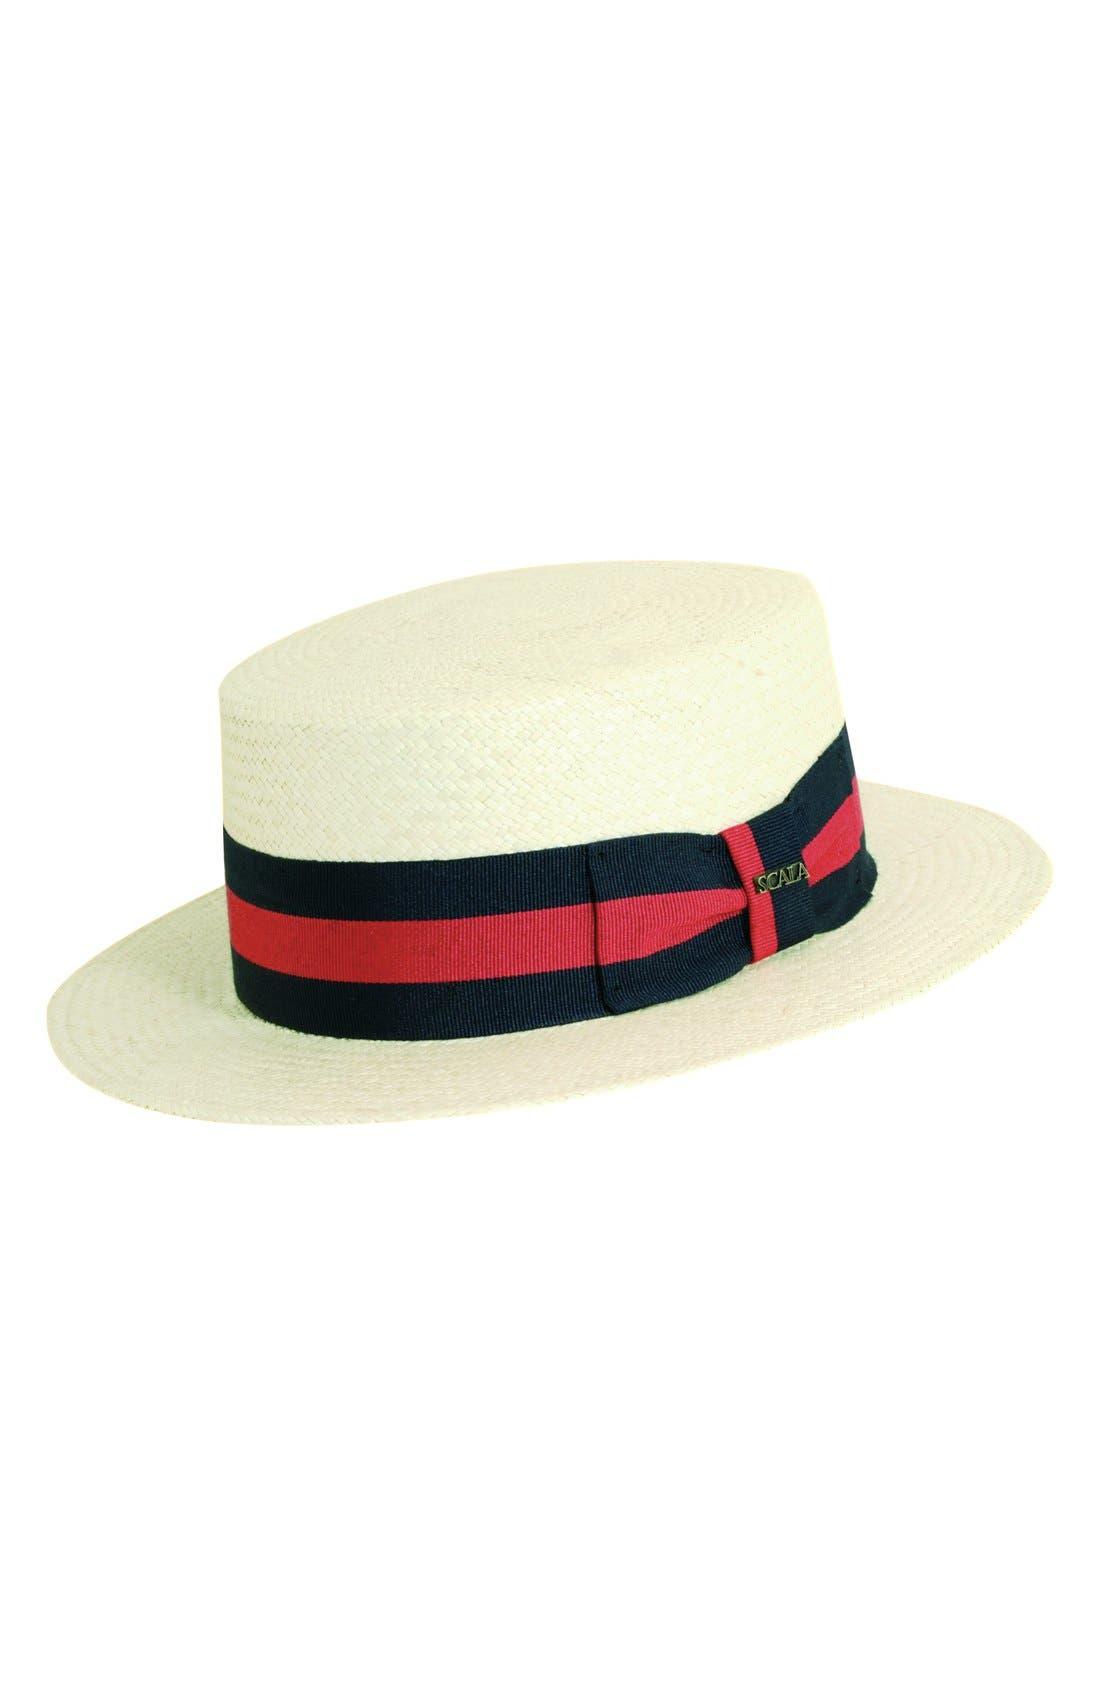 Scala Panama Straw Boater Hat